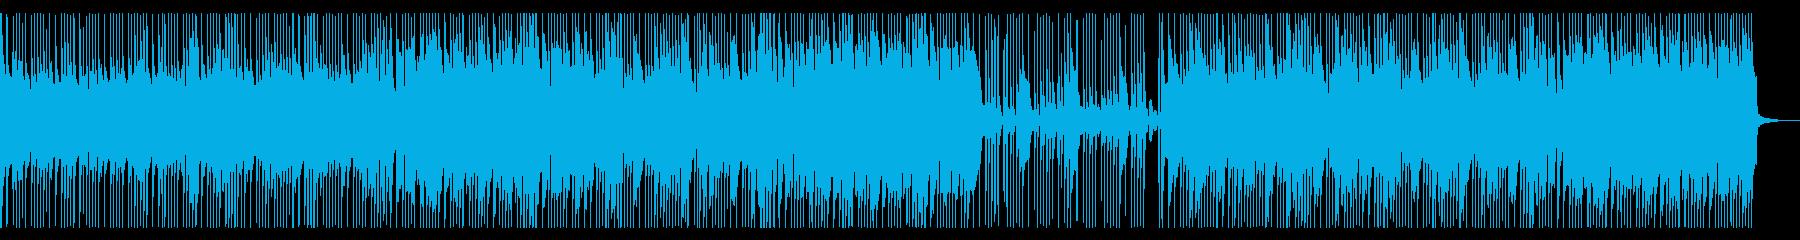 YouTube 陽気なトークBGMの再生済みの波形